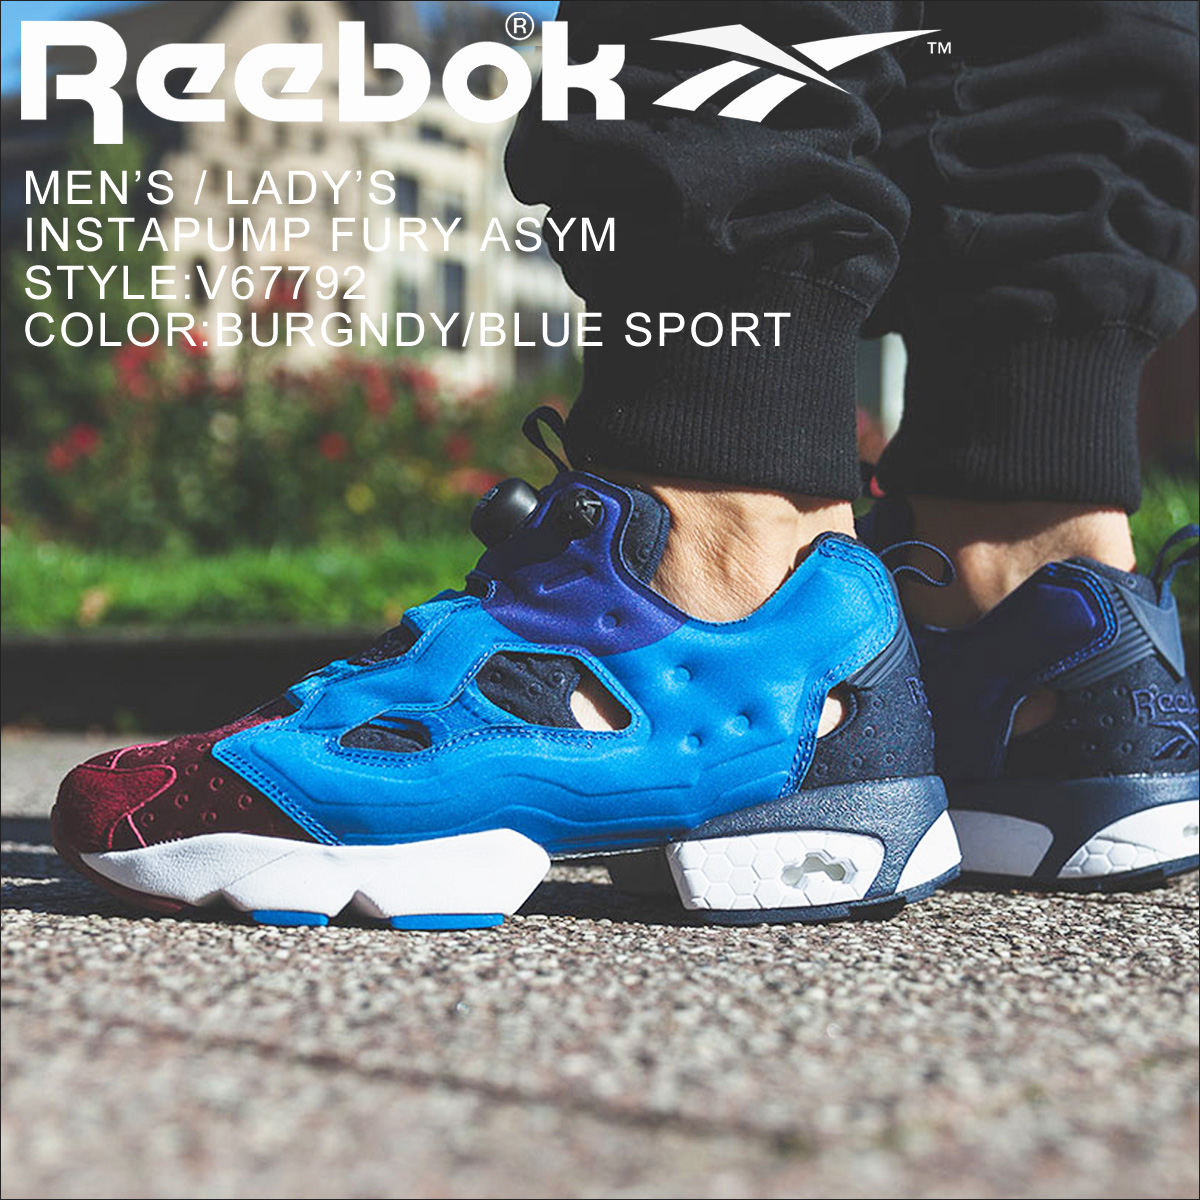 24c99428bc0 Reebok Reebok pump fury sneakers INSTAPUMP FURY ASYM V67792 men s women s  shoes blue